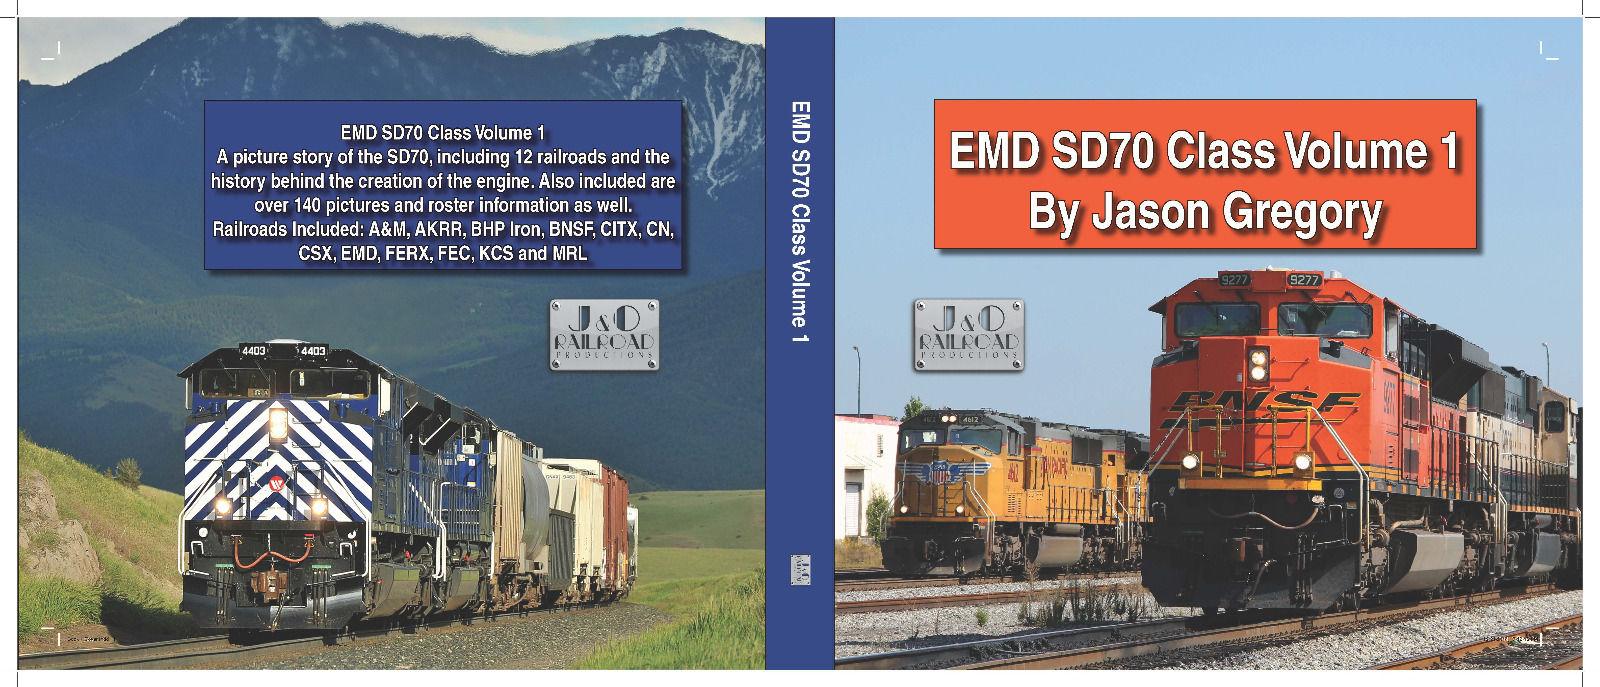 EMD SD70 Class Volume 1